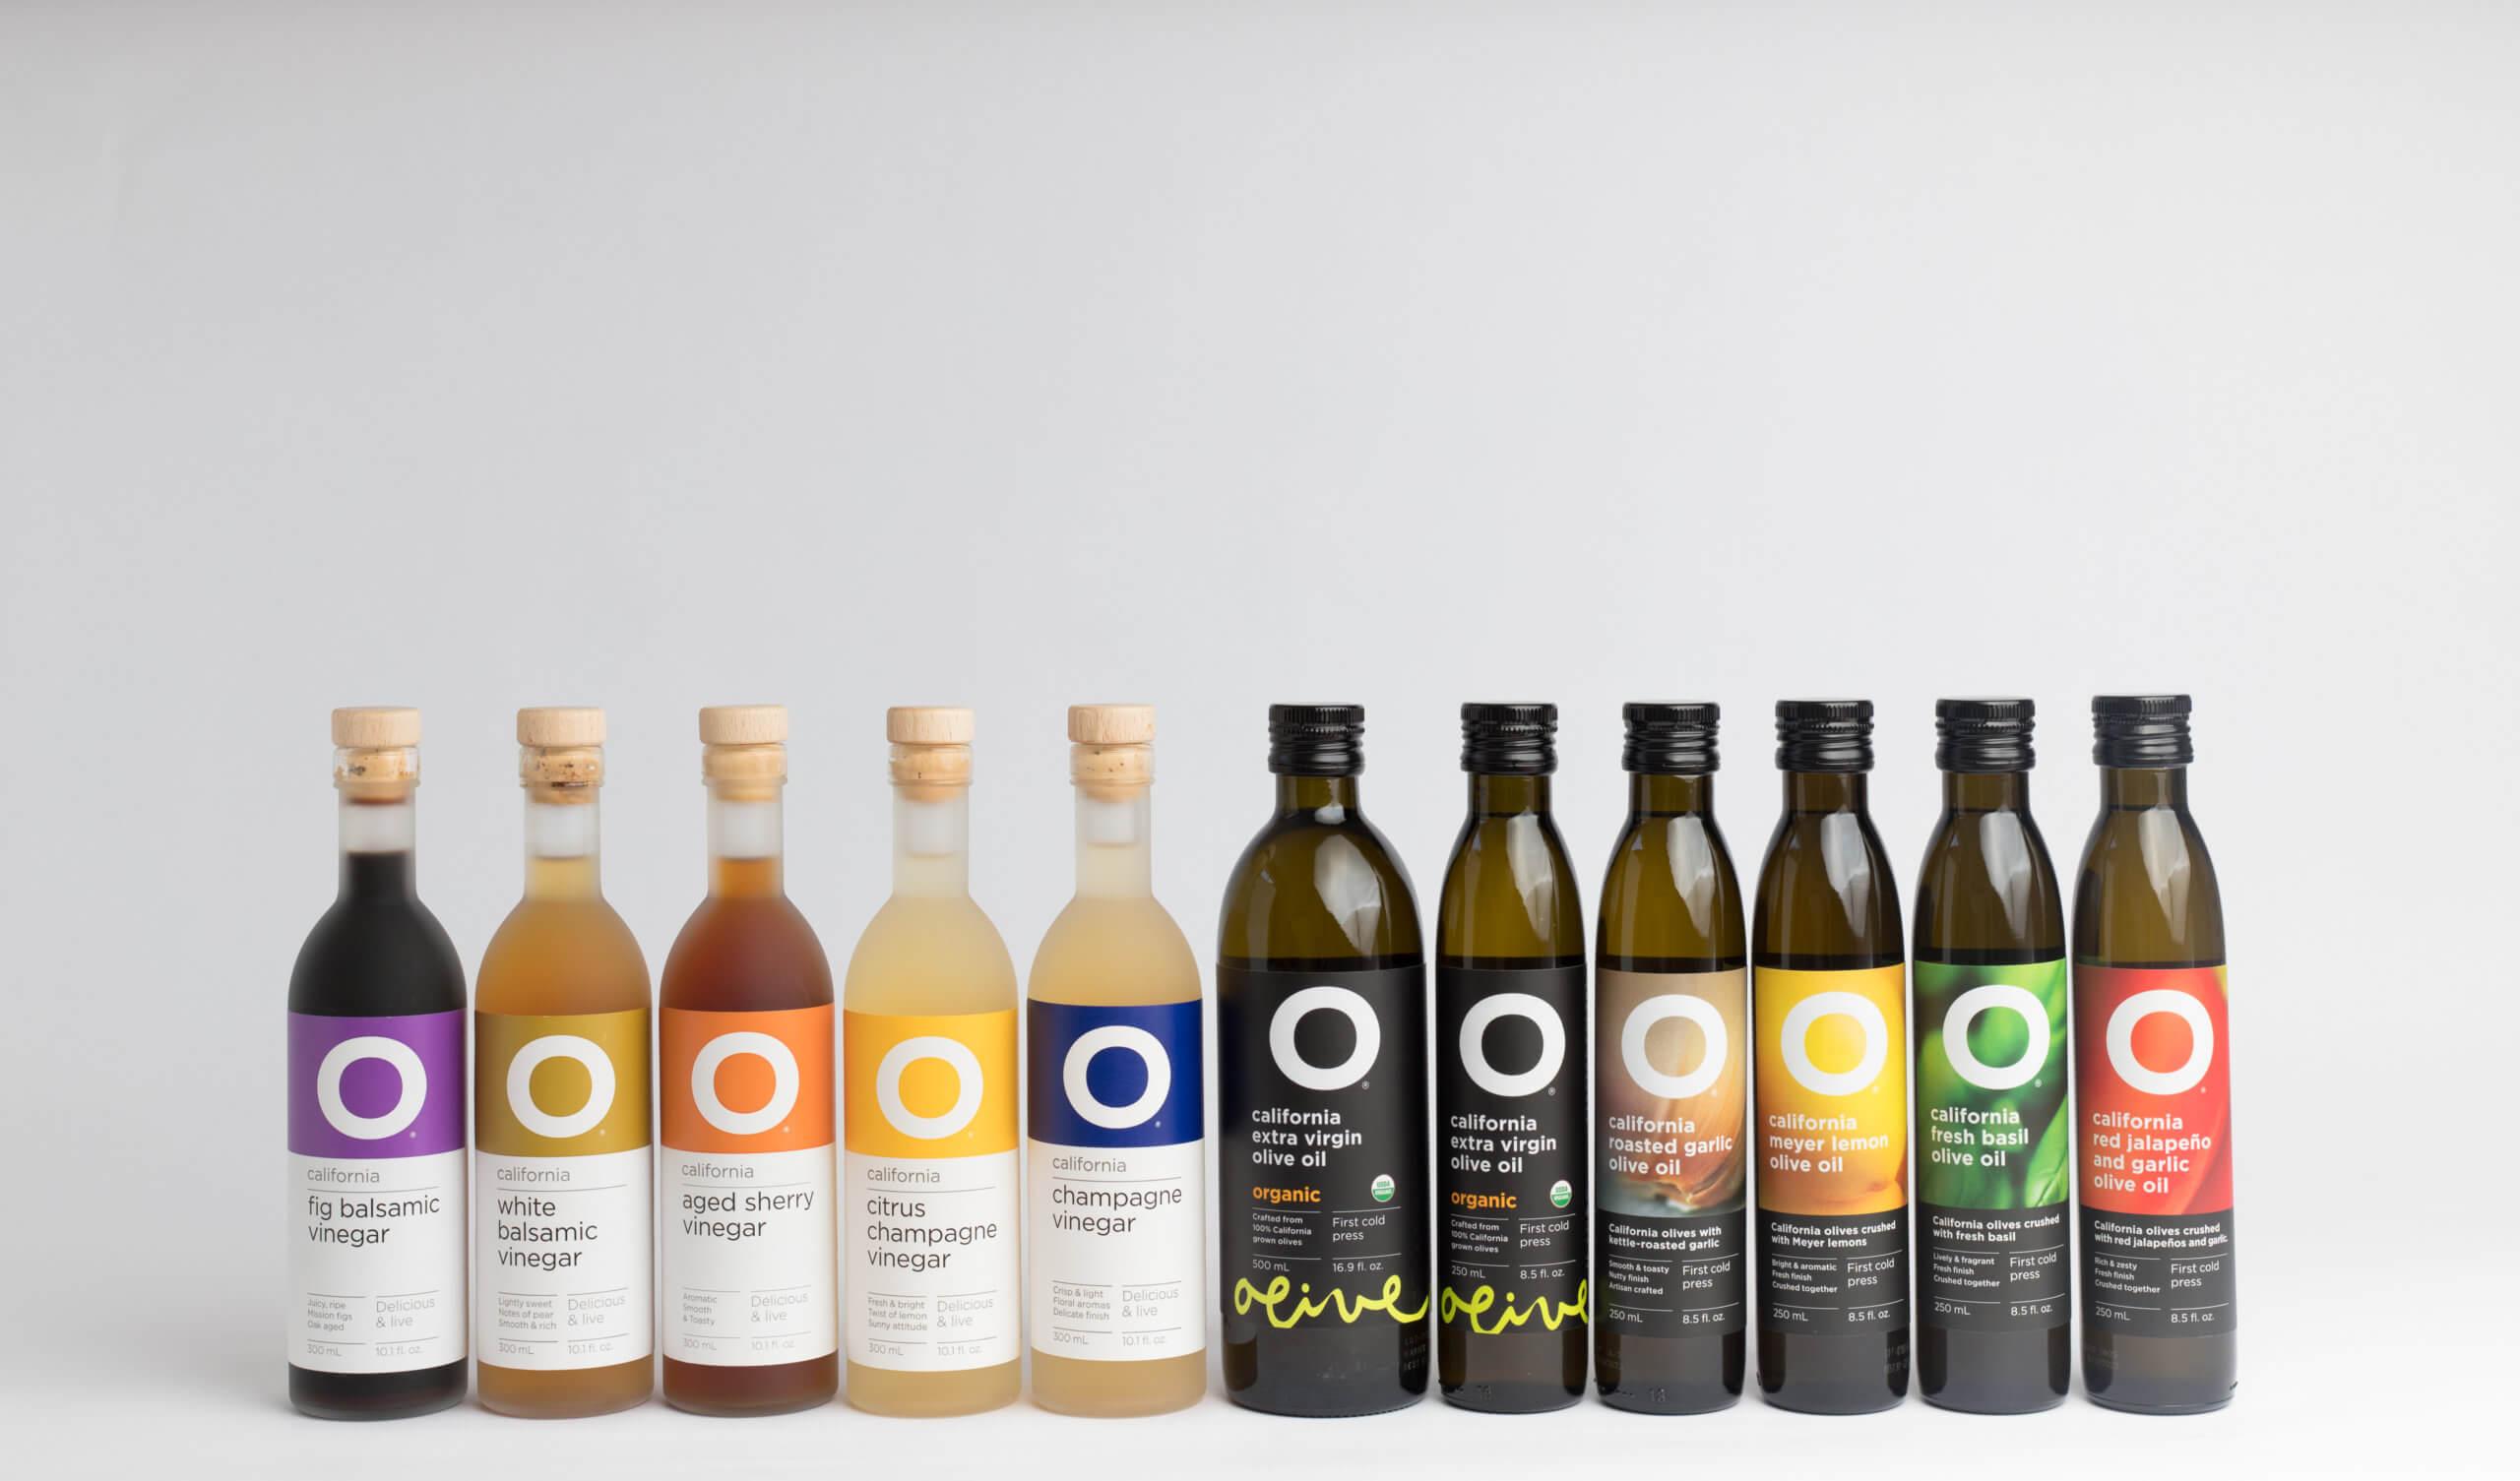 O Olive Oils & Vinegar products